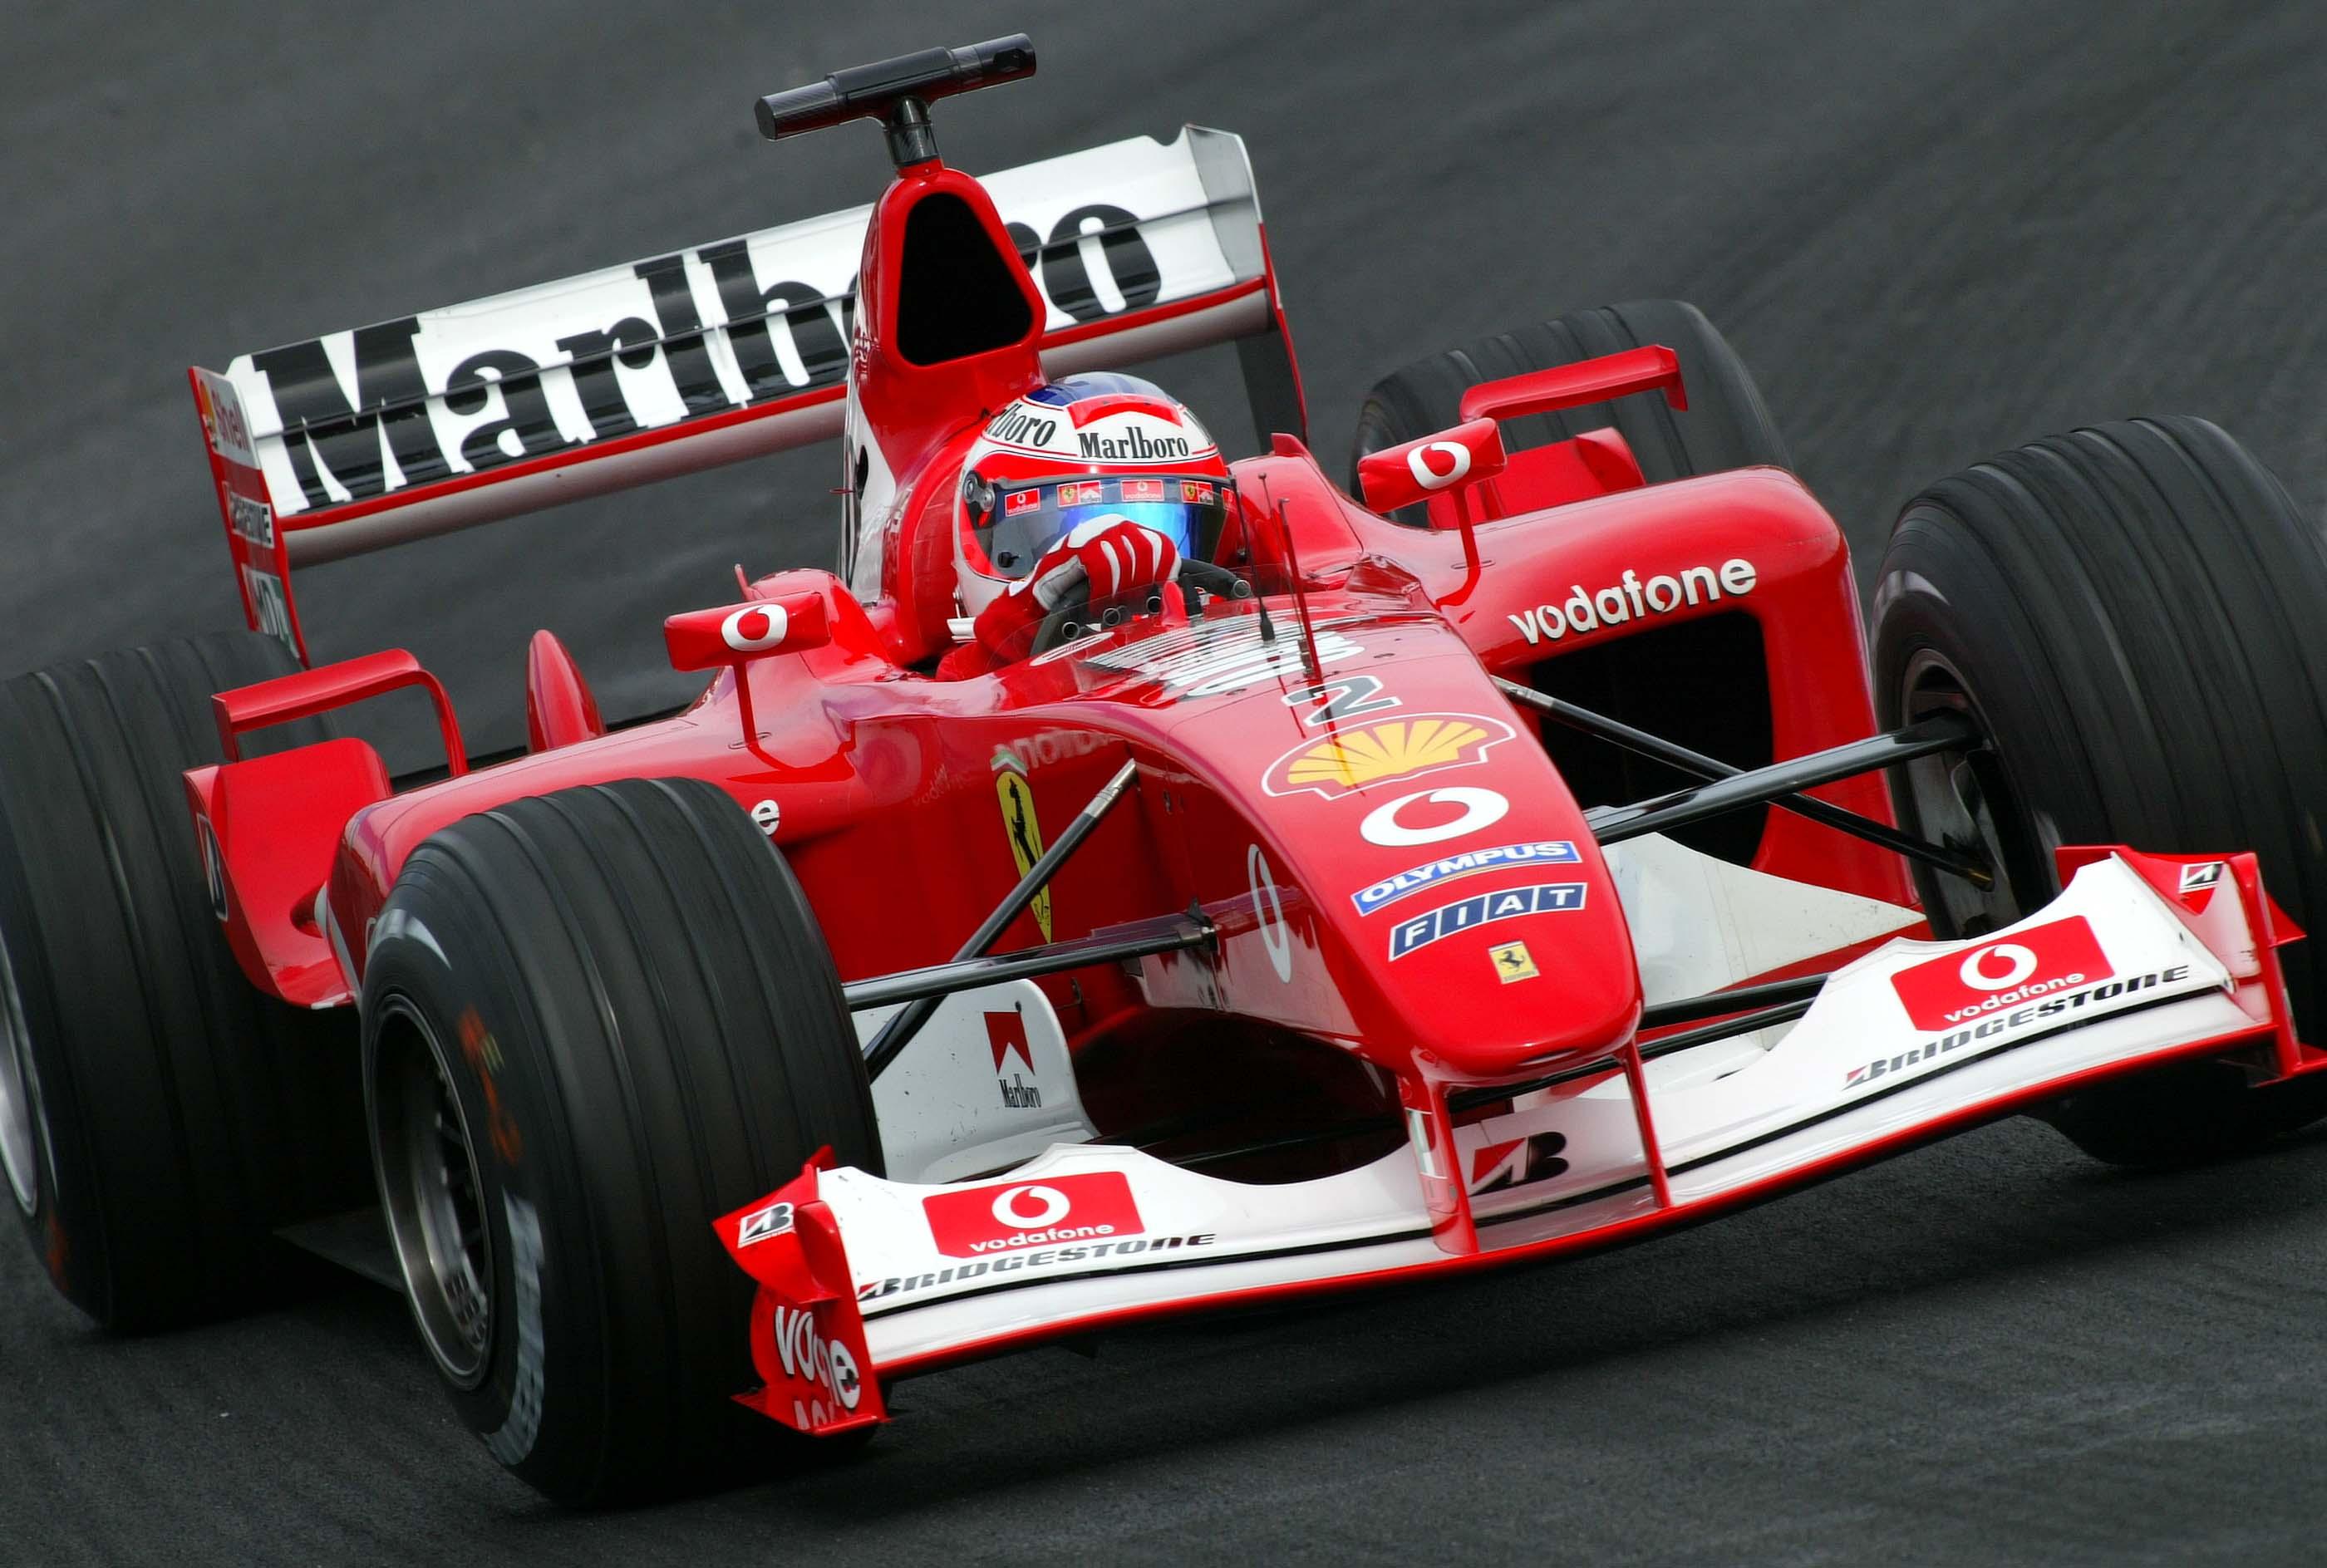 Sao Paolo, F1, Sa, Rubens Barrichello (br, Ferrari)